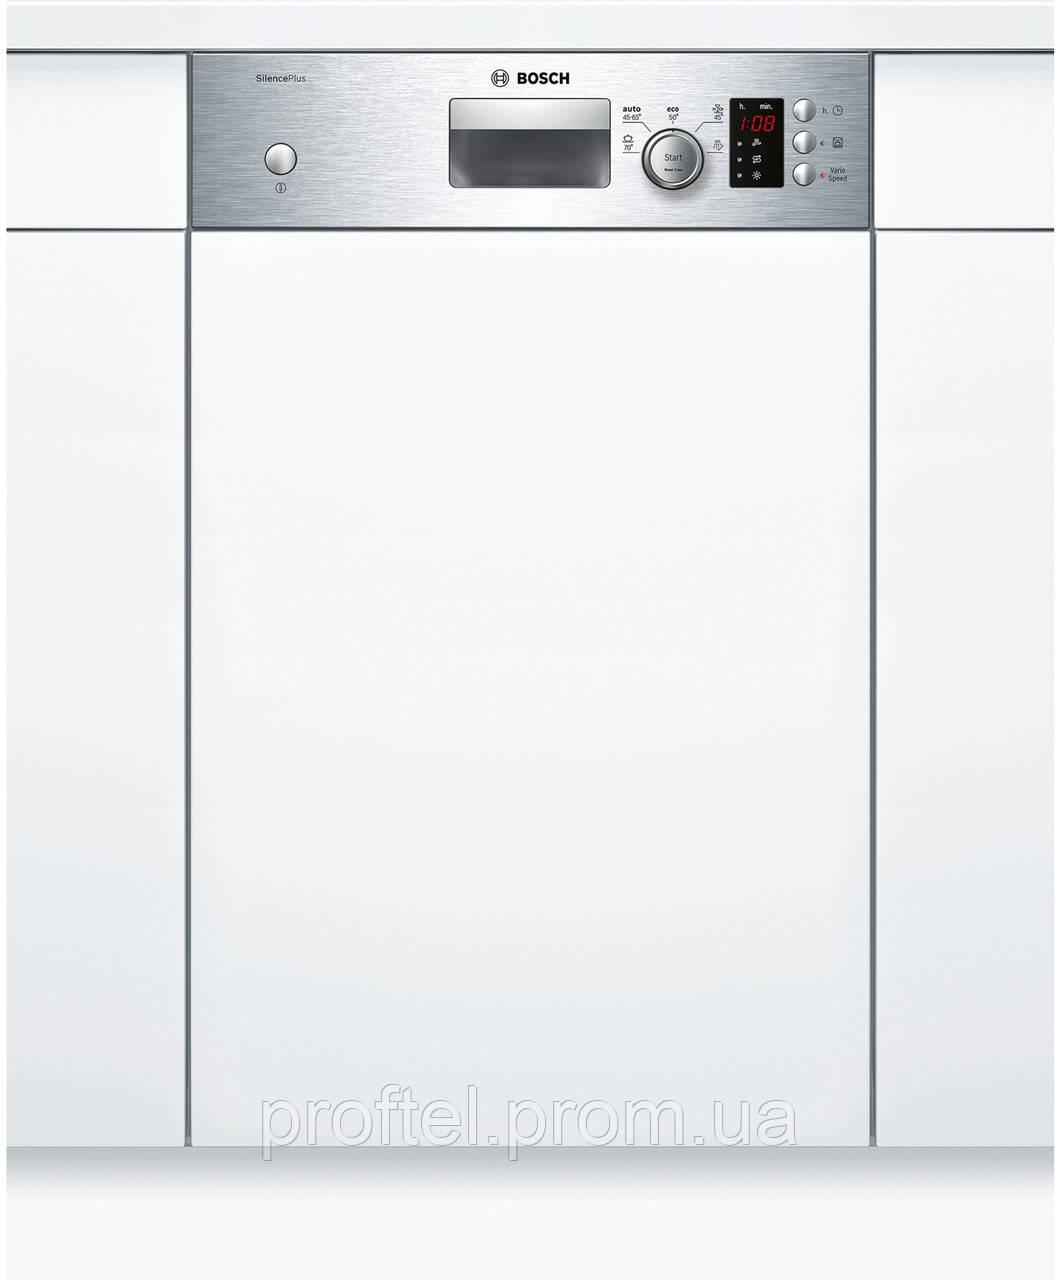 Встраиваемая посудомоечная машина BOSCH SPI50E95EU